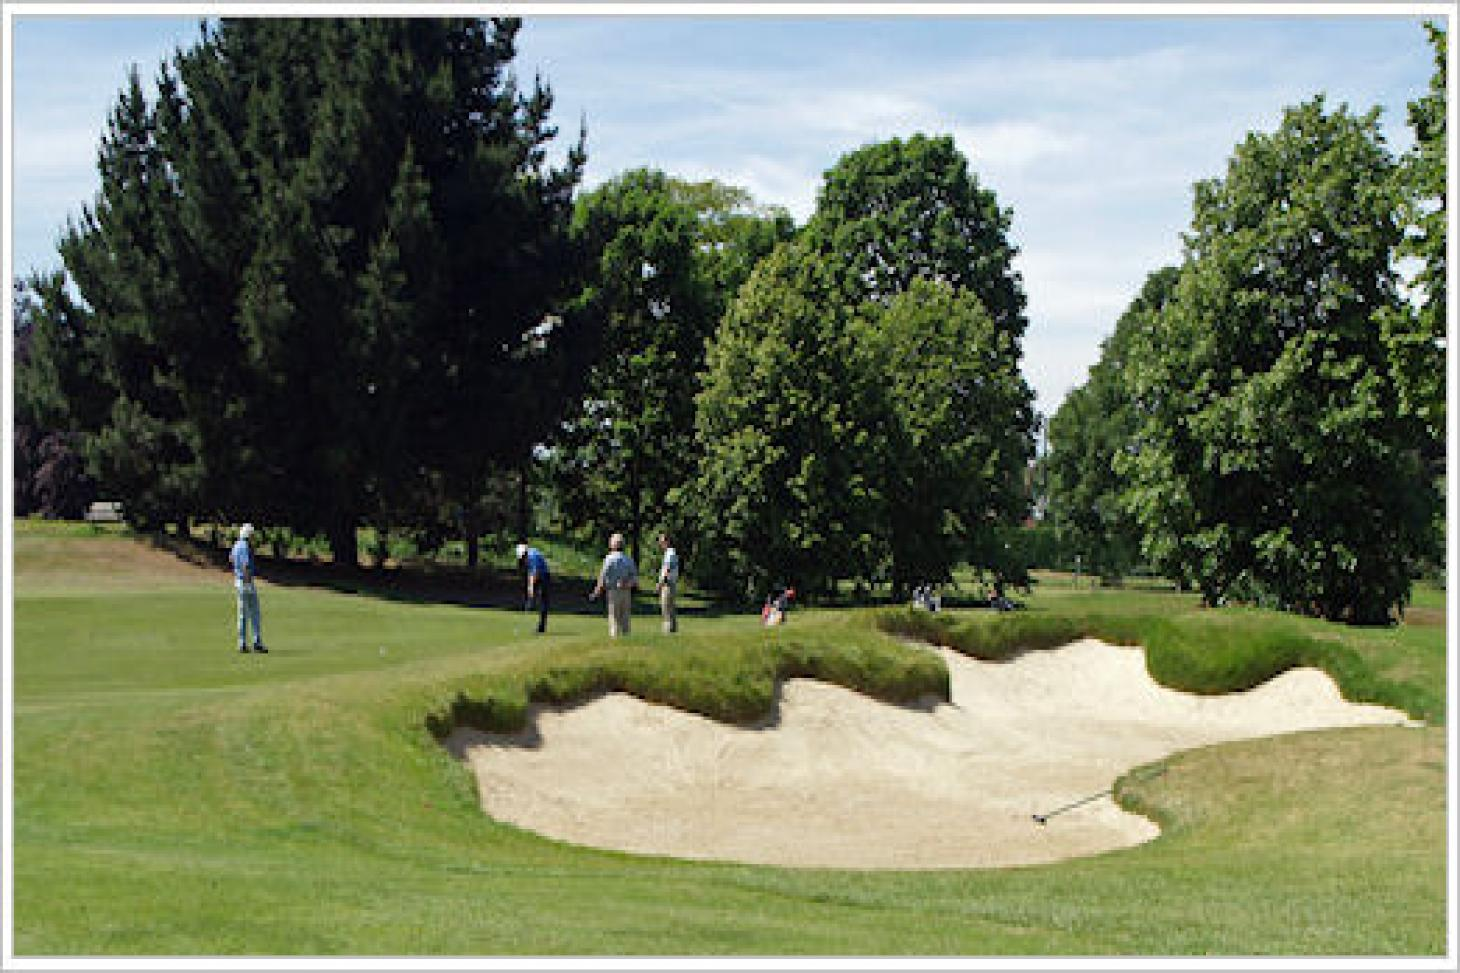 The Richmond Golf Club 18 hole golf course